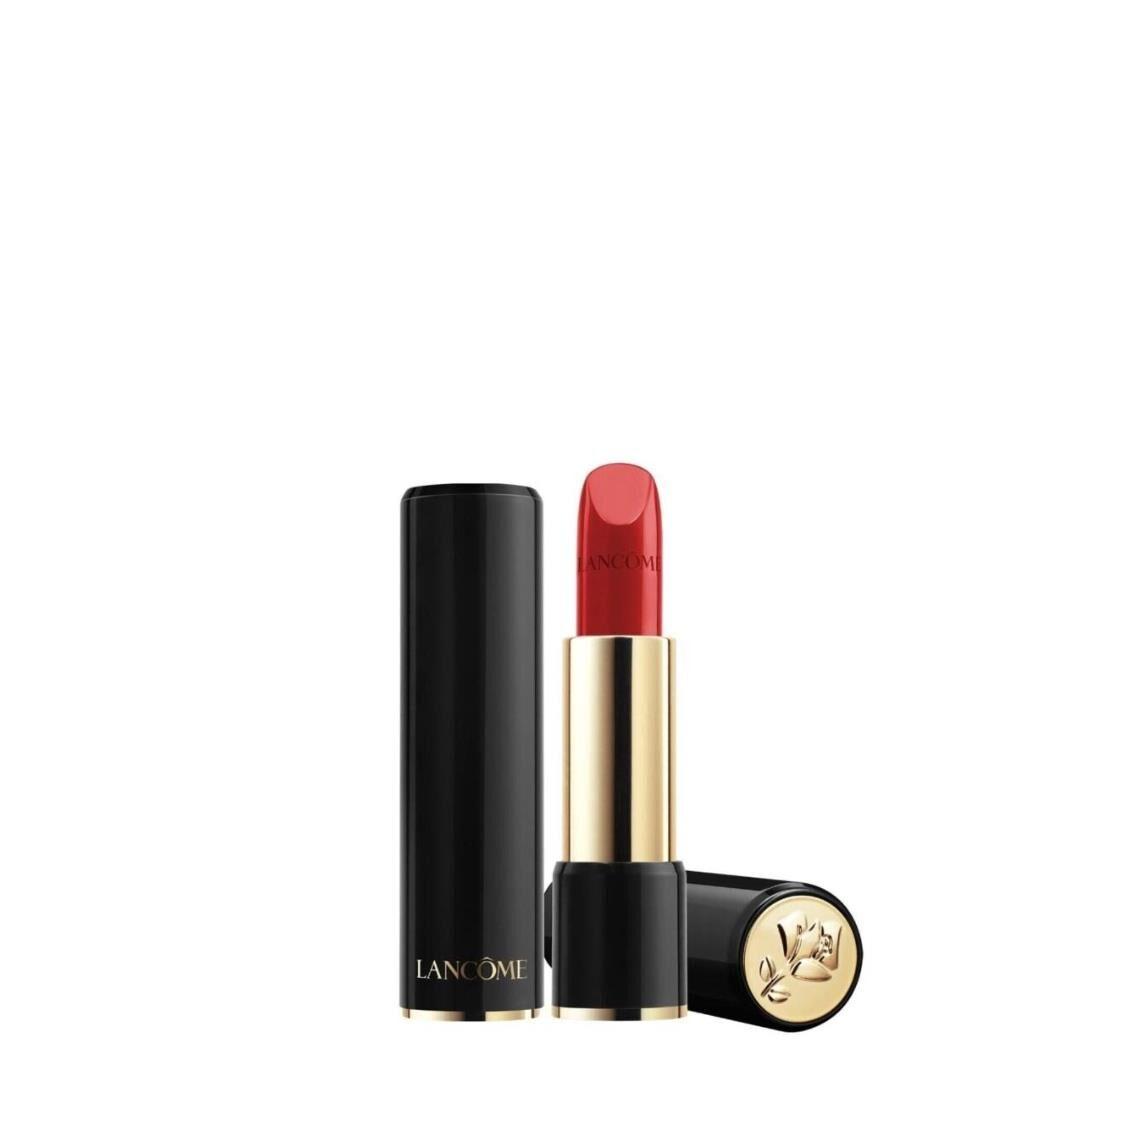 Lancome LAbsolu Rouge Cream 525